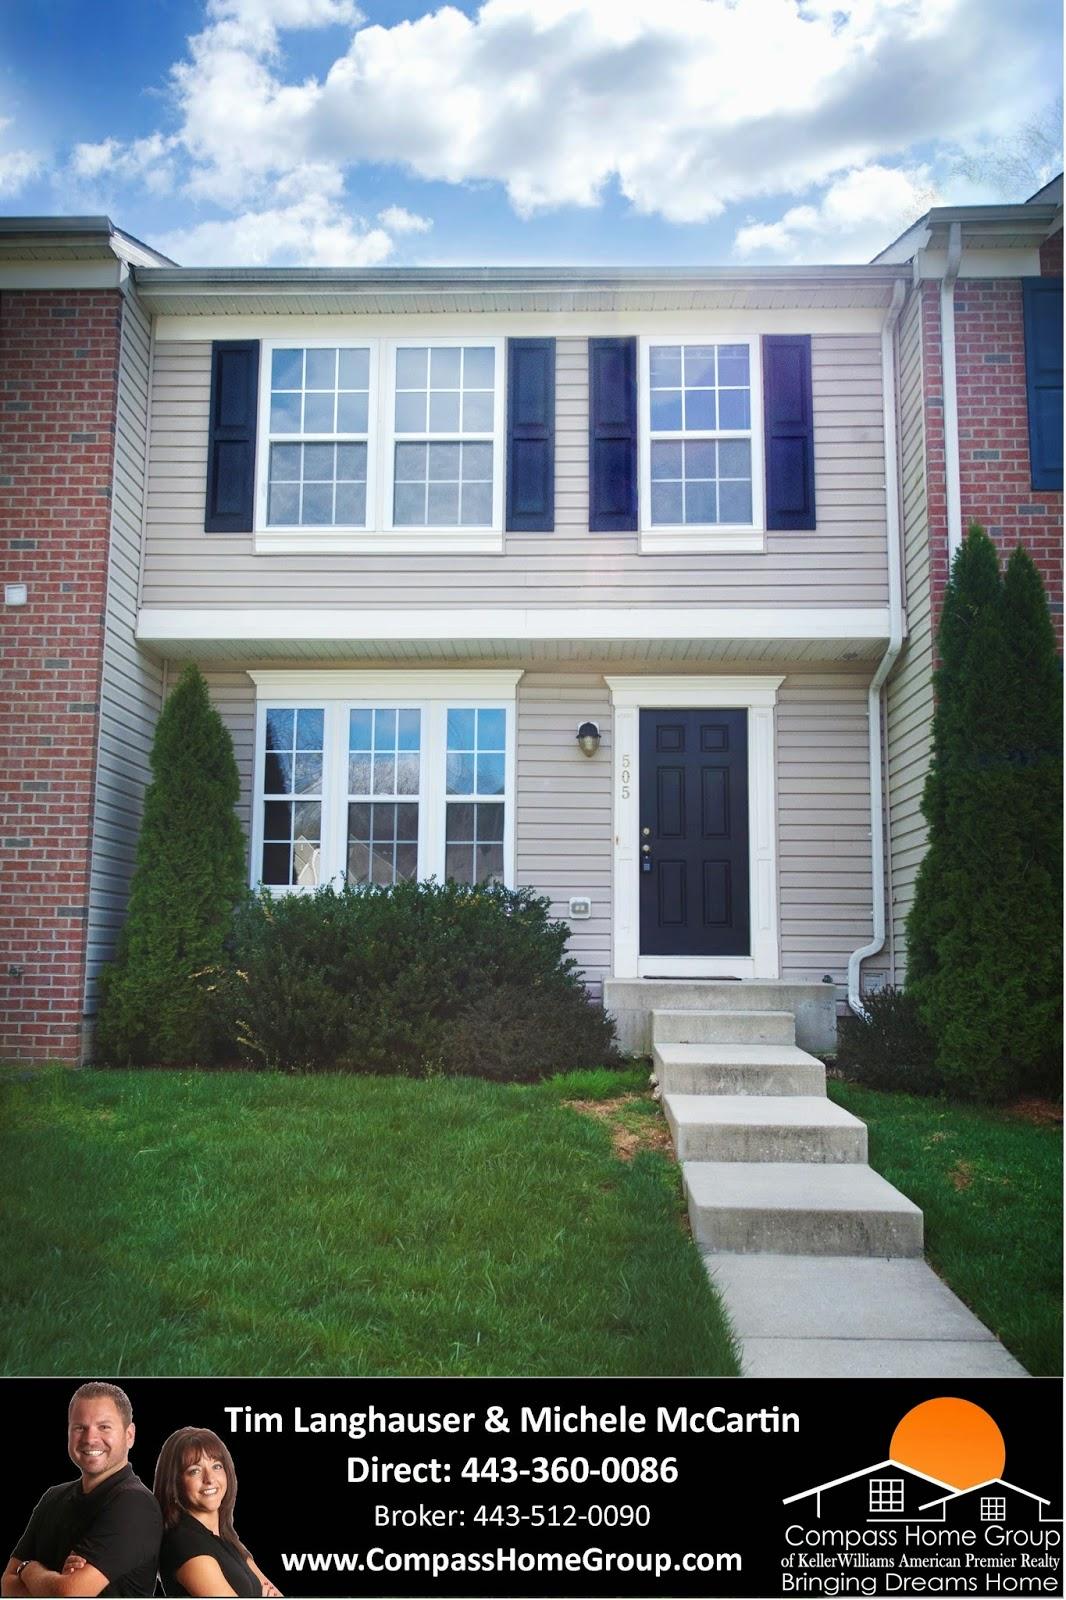 http://www.buy-sellmdhomes.com/listing/mlsid/161/propertyid/HR8326085/